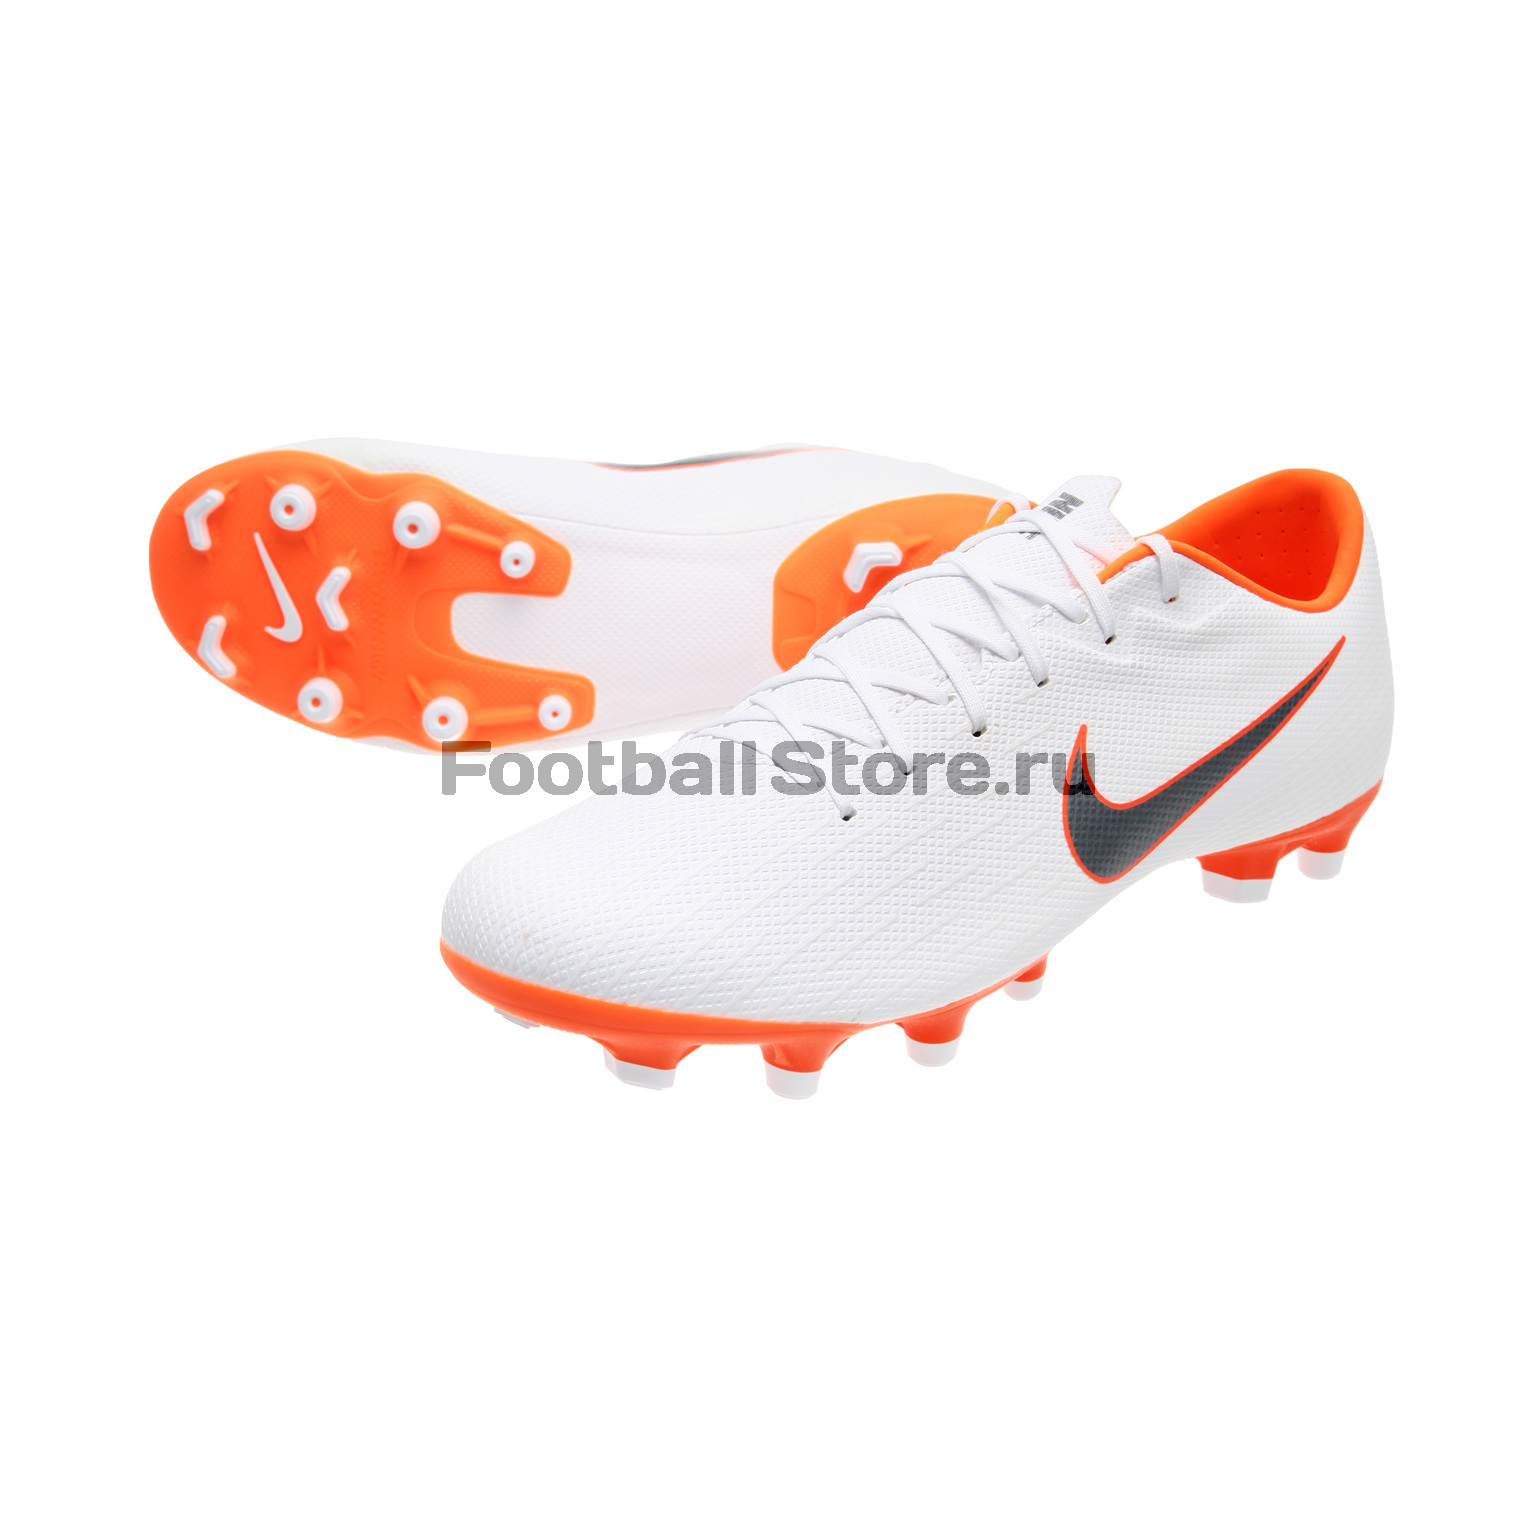 Бутсы Nike Vapor 12 Academy FG/MG AH7375-107